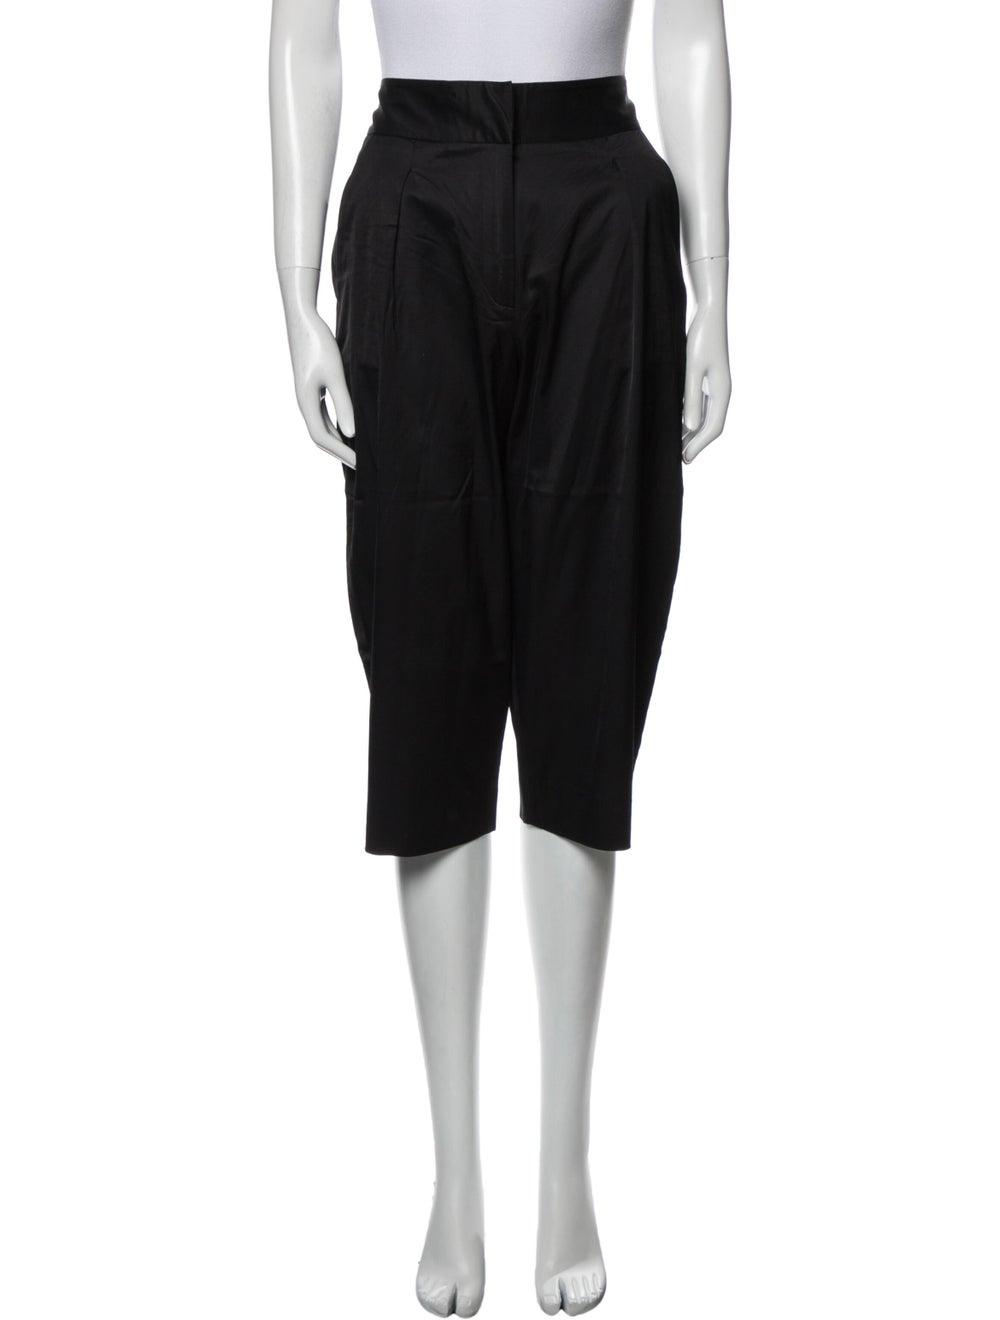 L'Agence Wide Leg Pants Black - image 1